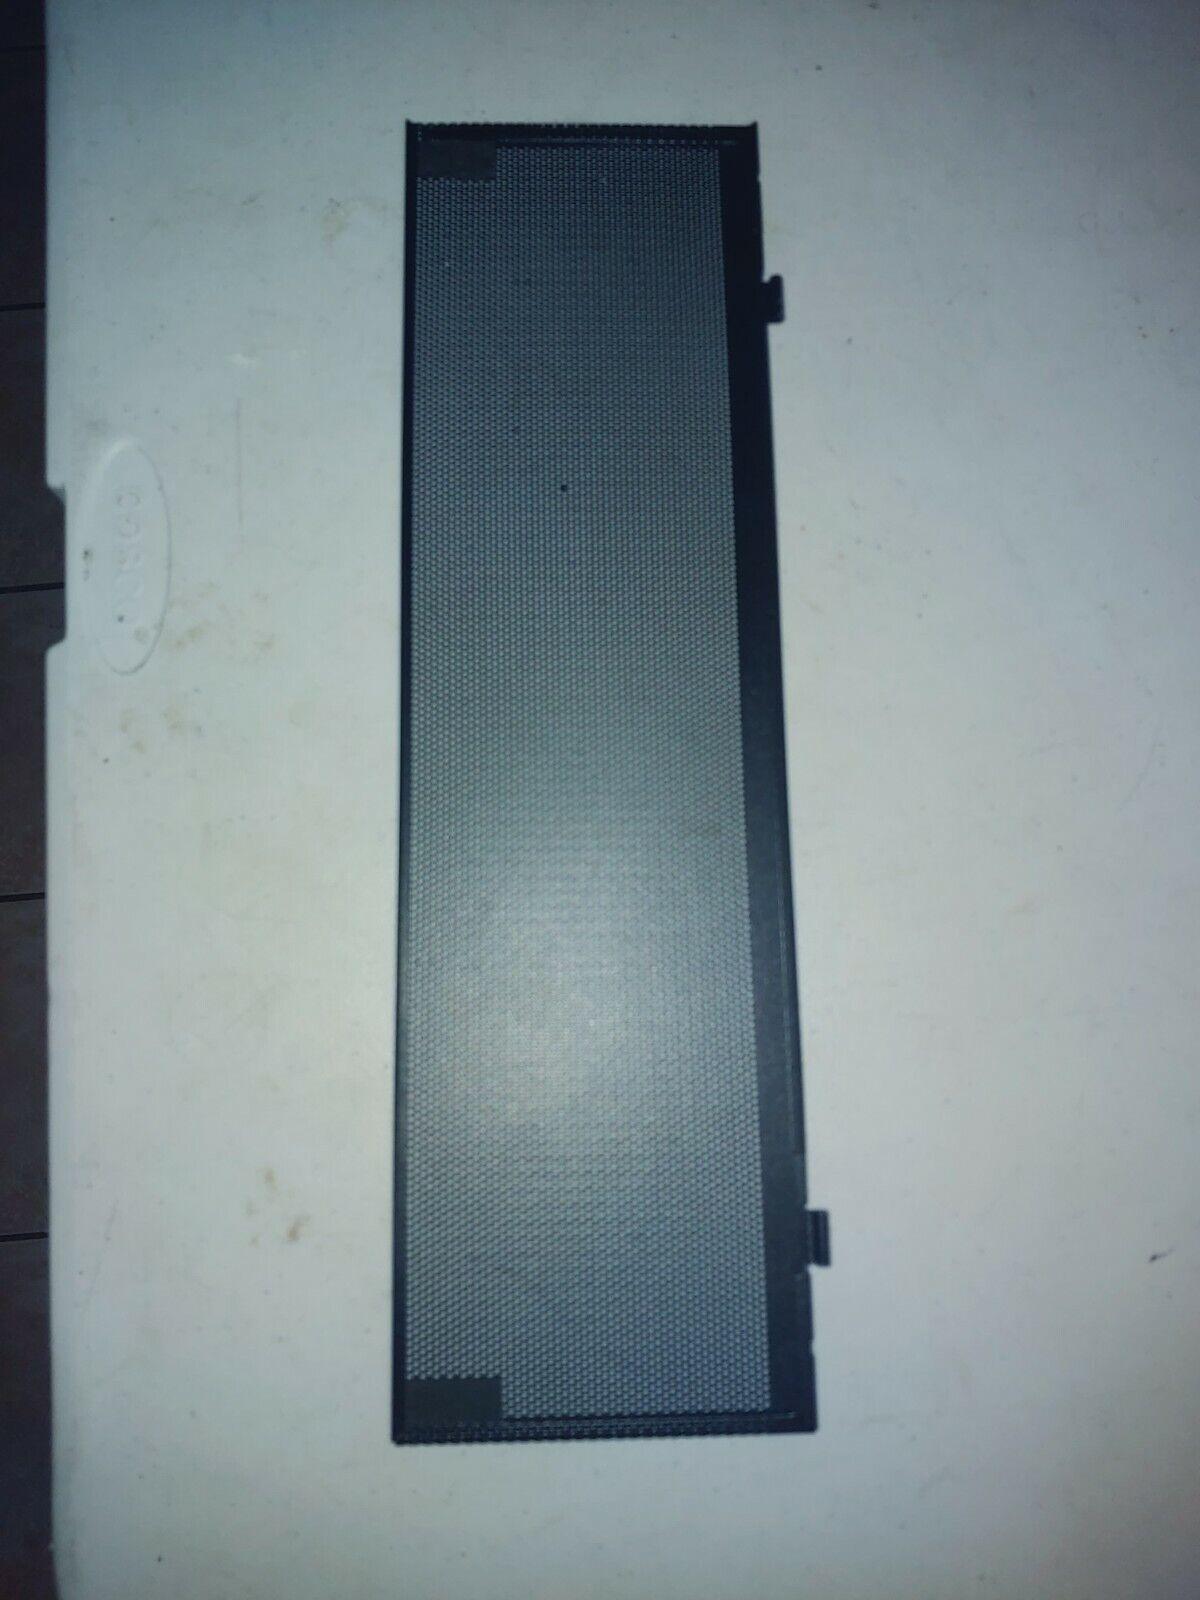 Lancool-II-Mesh-rgb Side Panel This Is Just The Mesh Bottom Side Panel  - $10.00